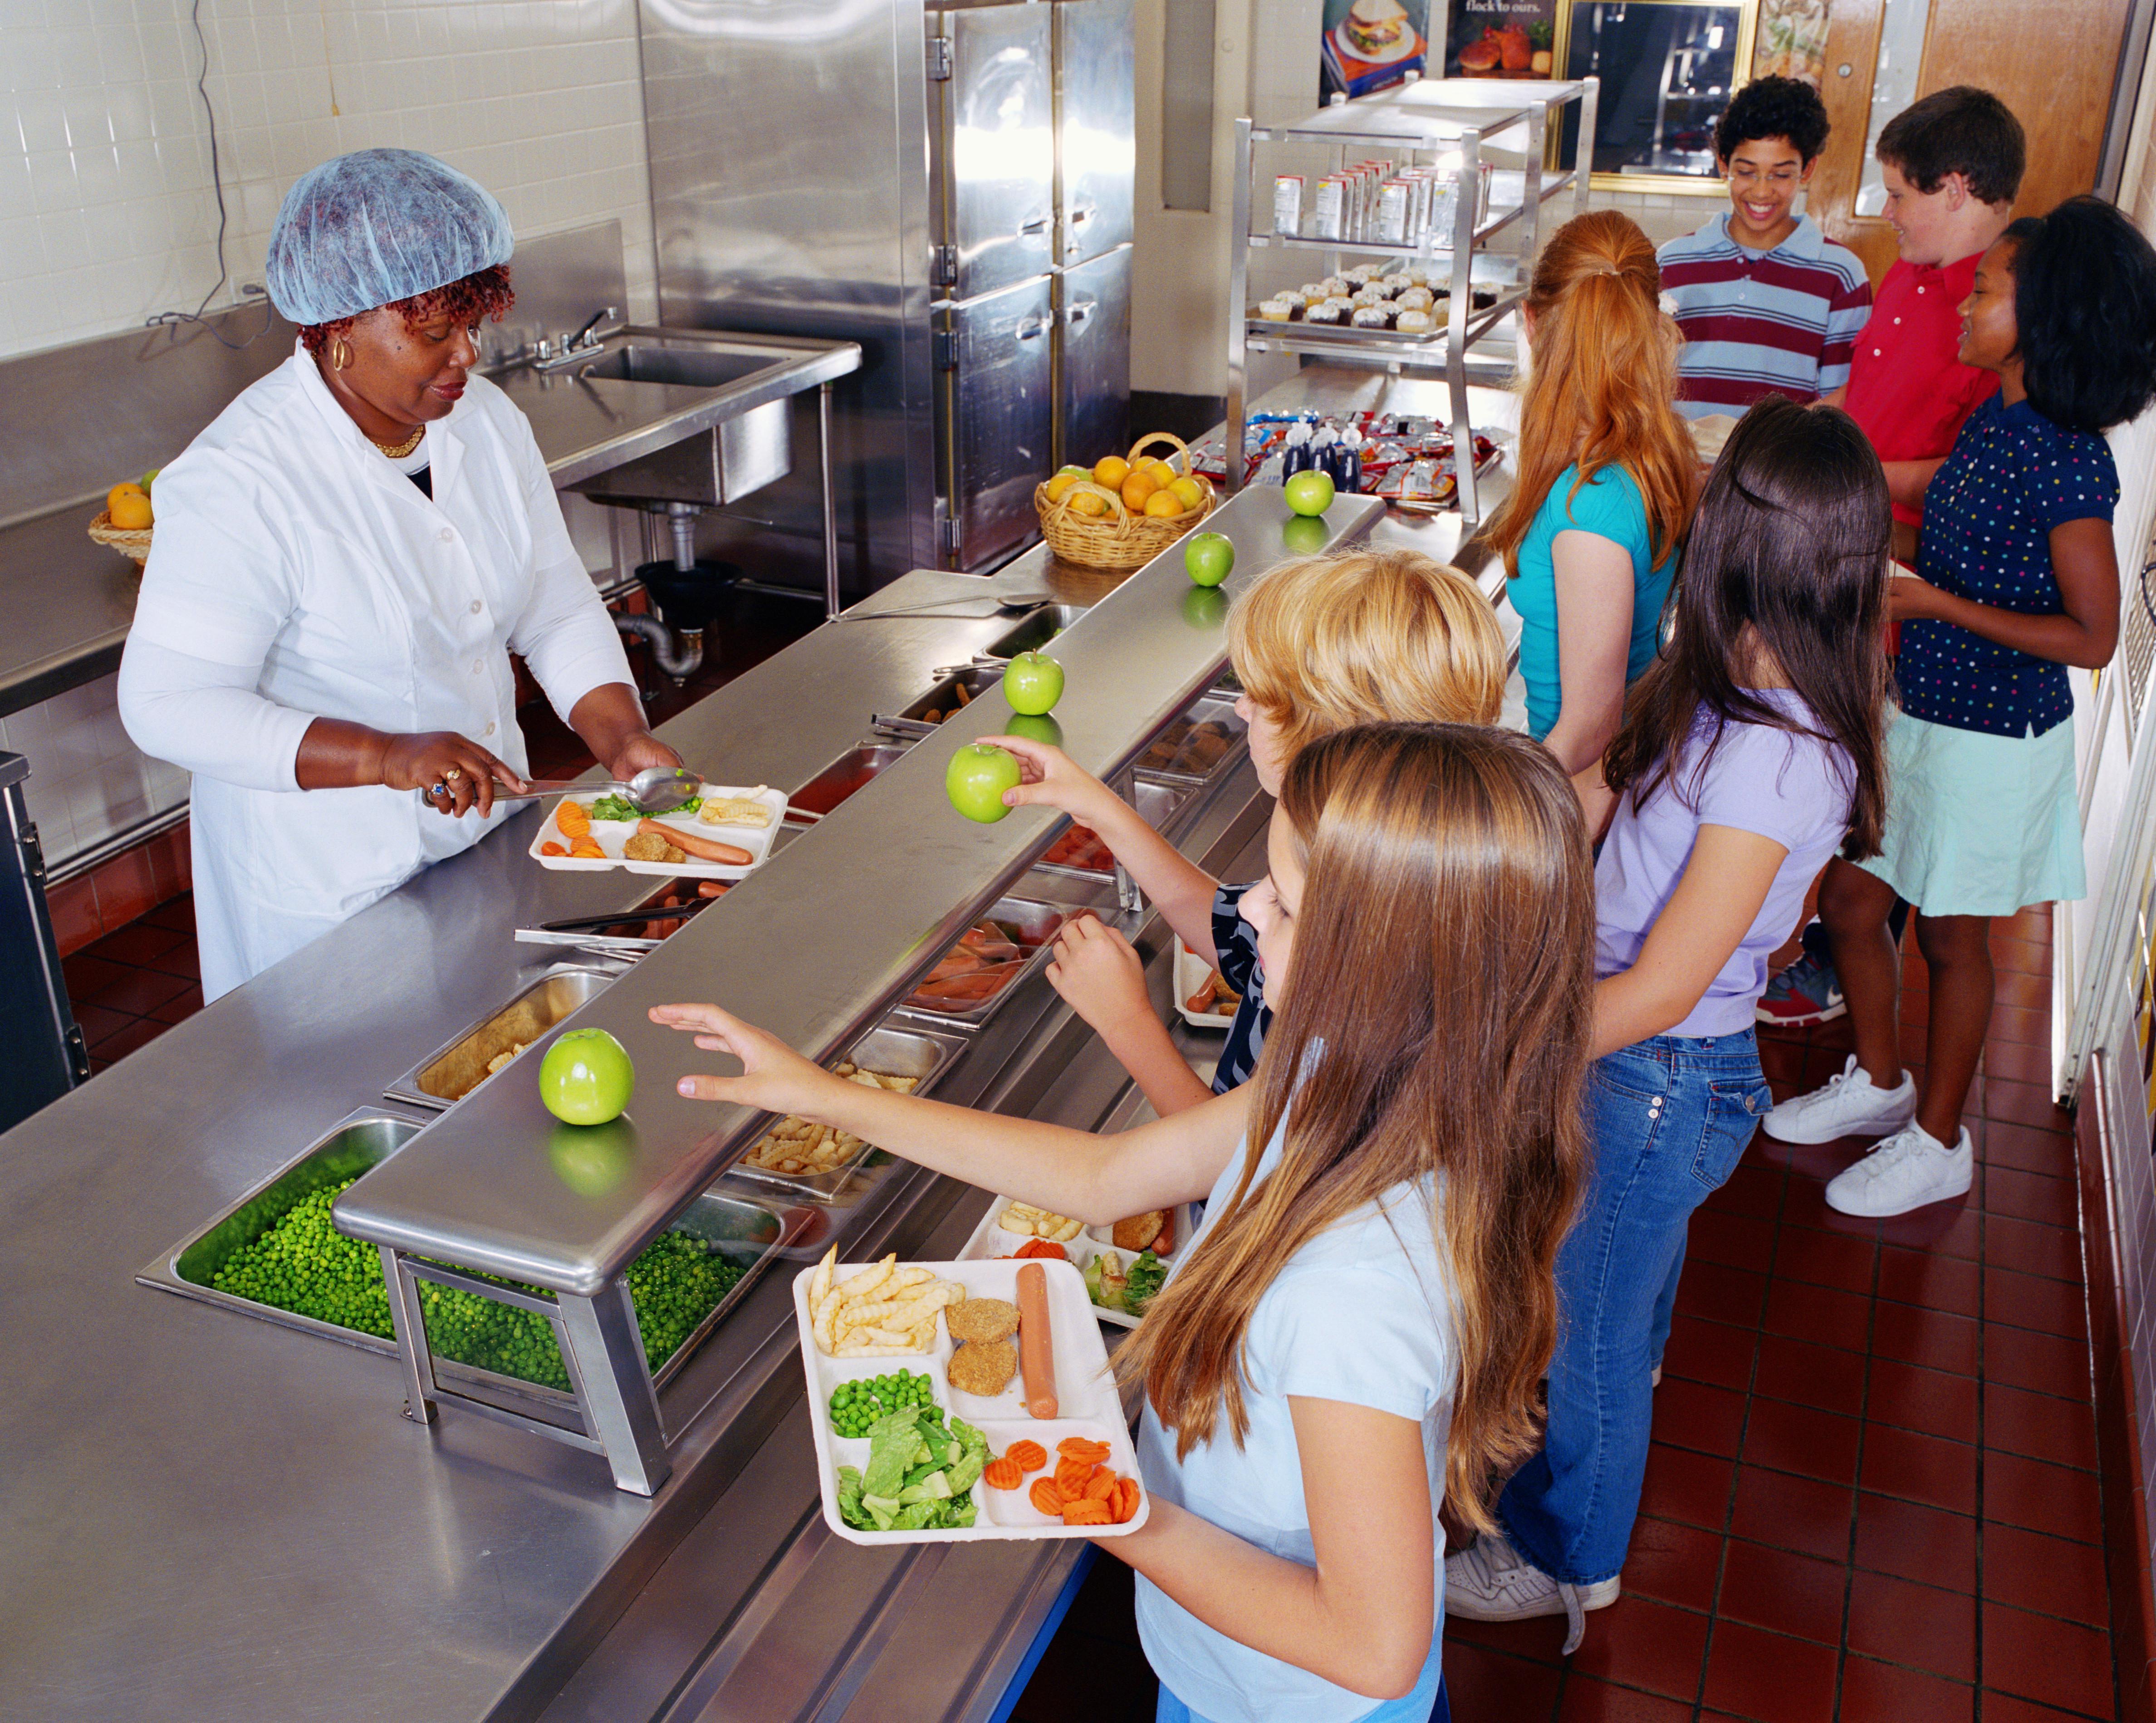 Woman serving food to schoolchildren (10-13) in cafeteria